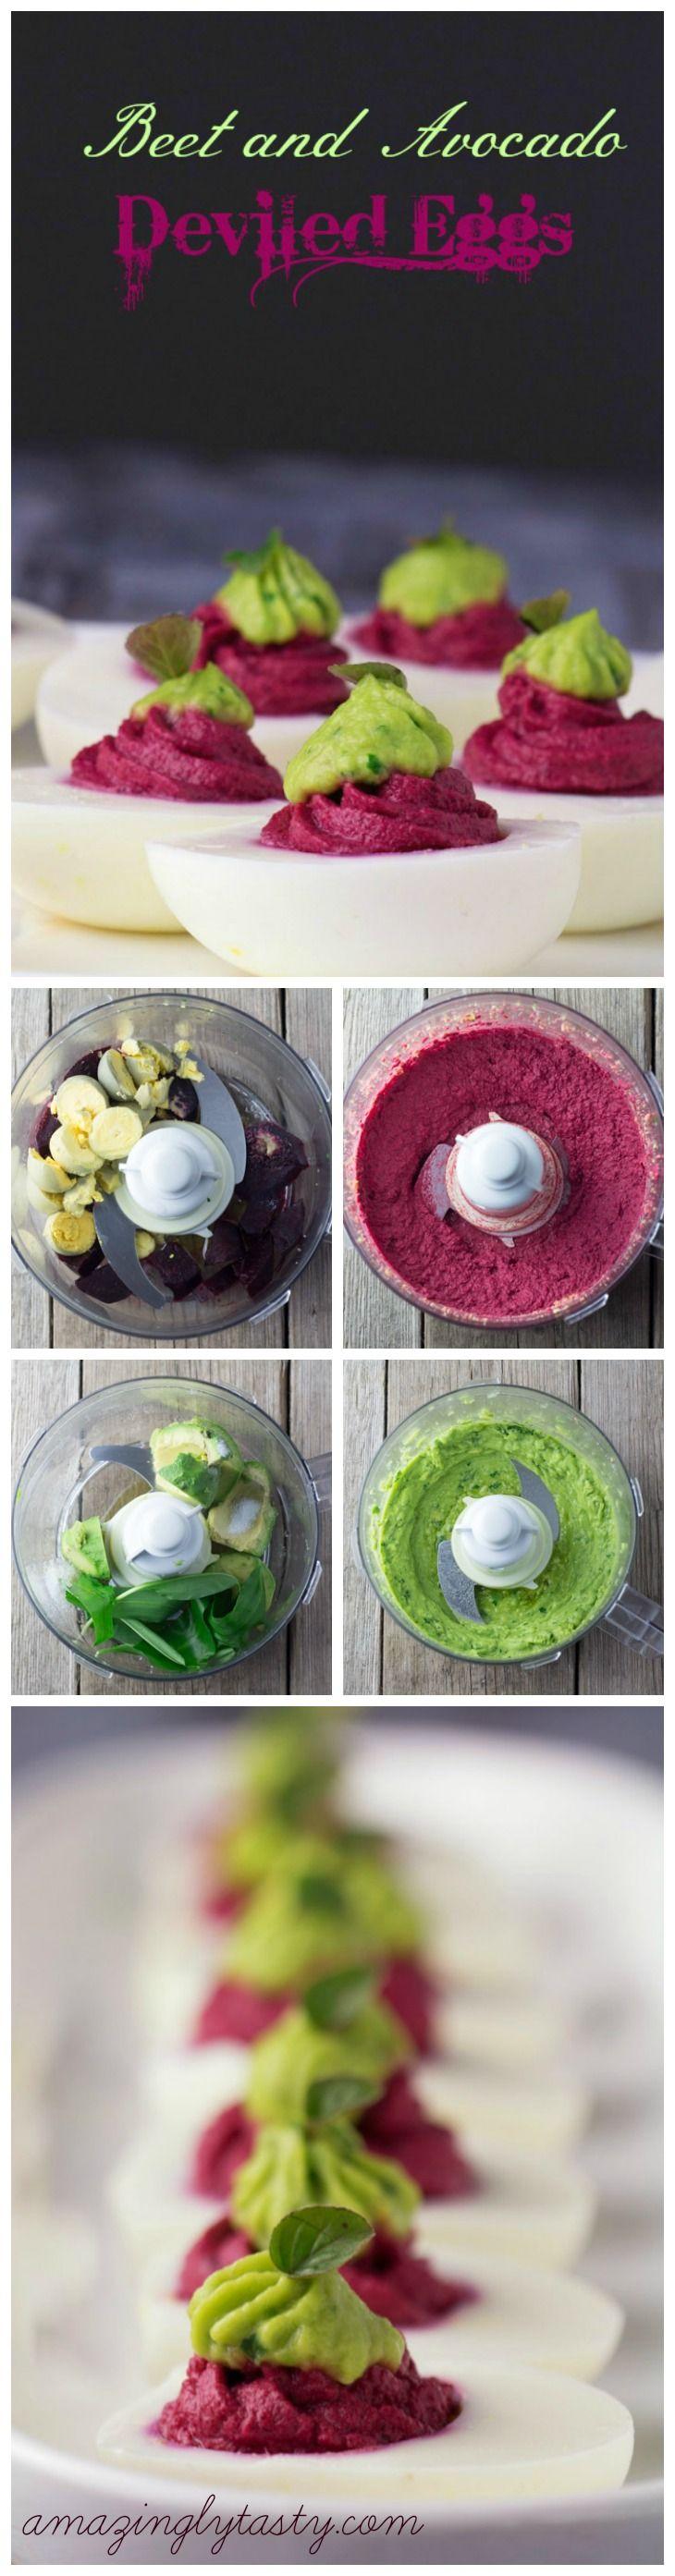 Beet and Avocado Deviled Eggs by amazinglytasty #Eggs #Beet #Avocado #Healthy